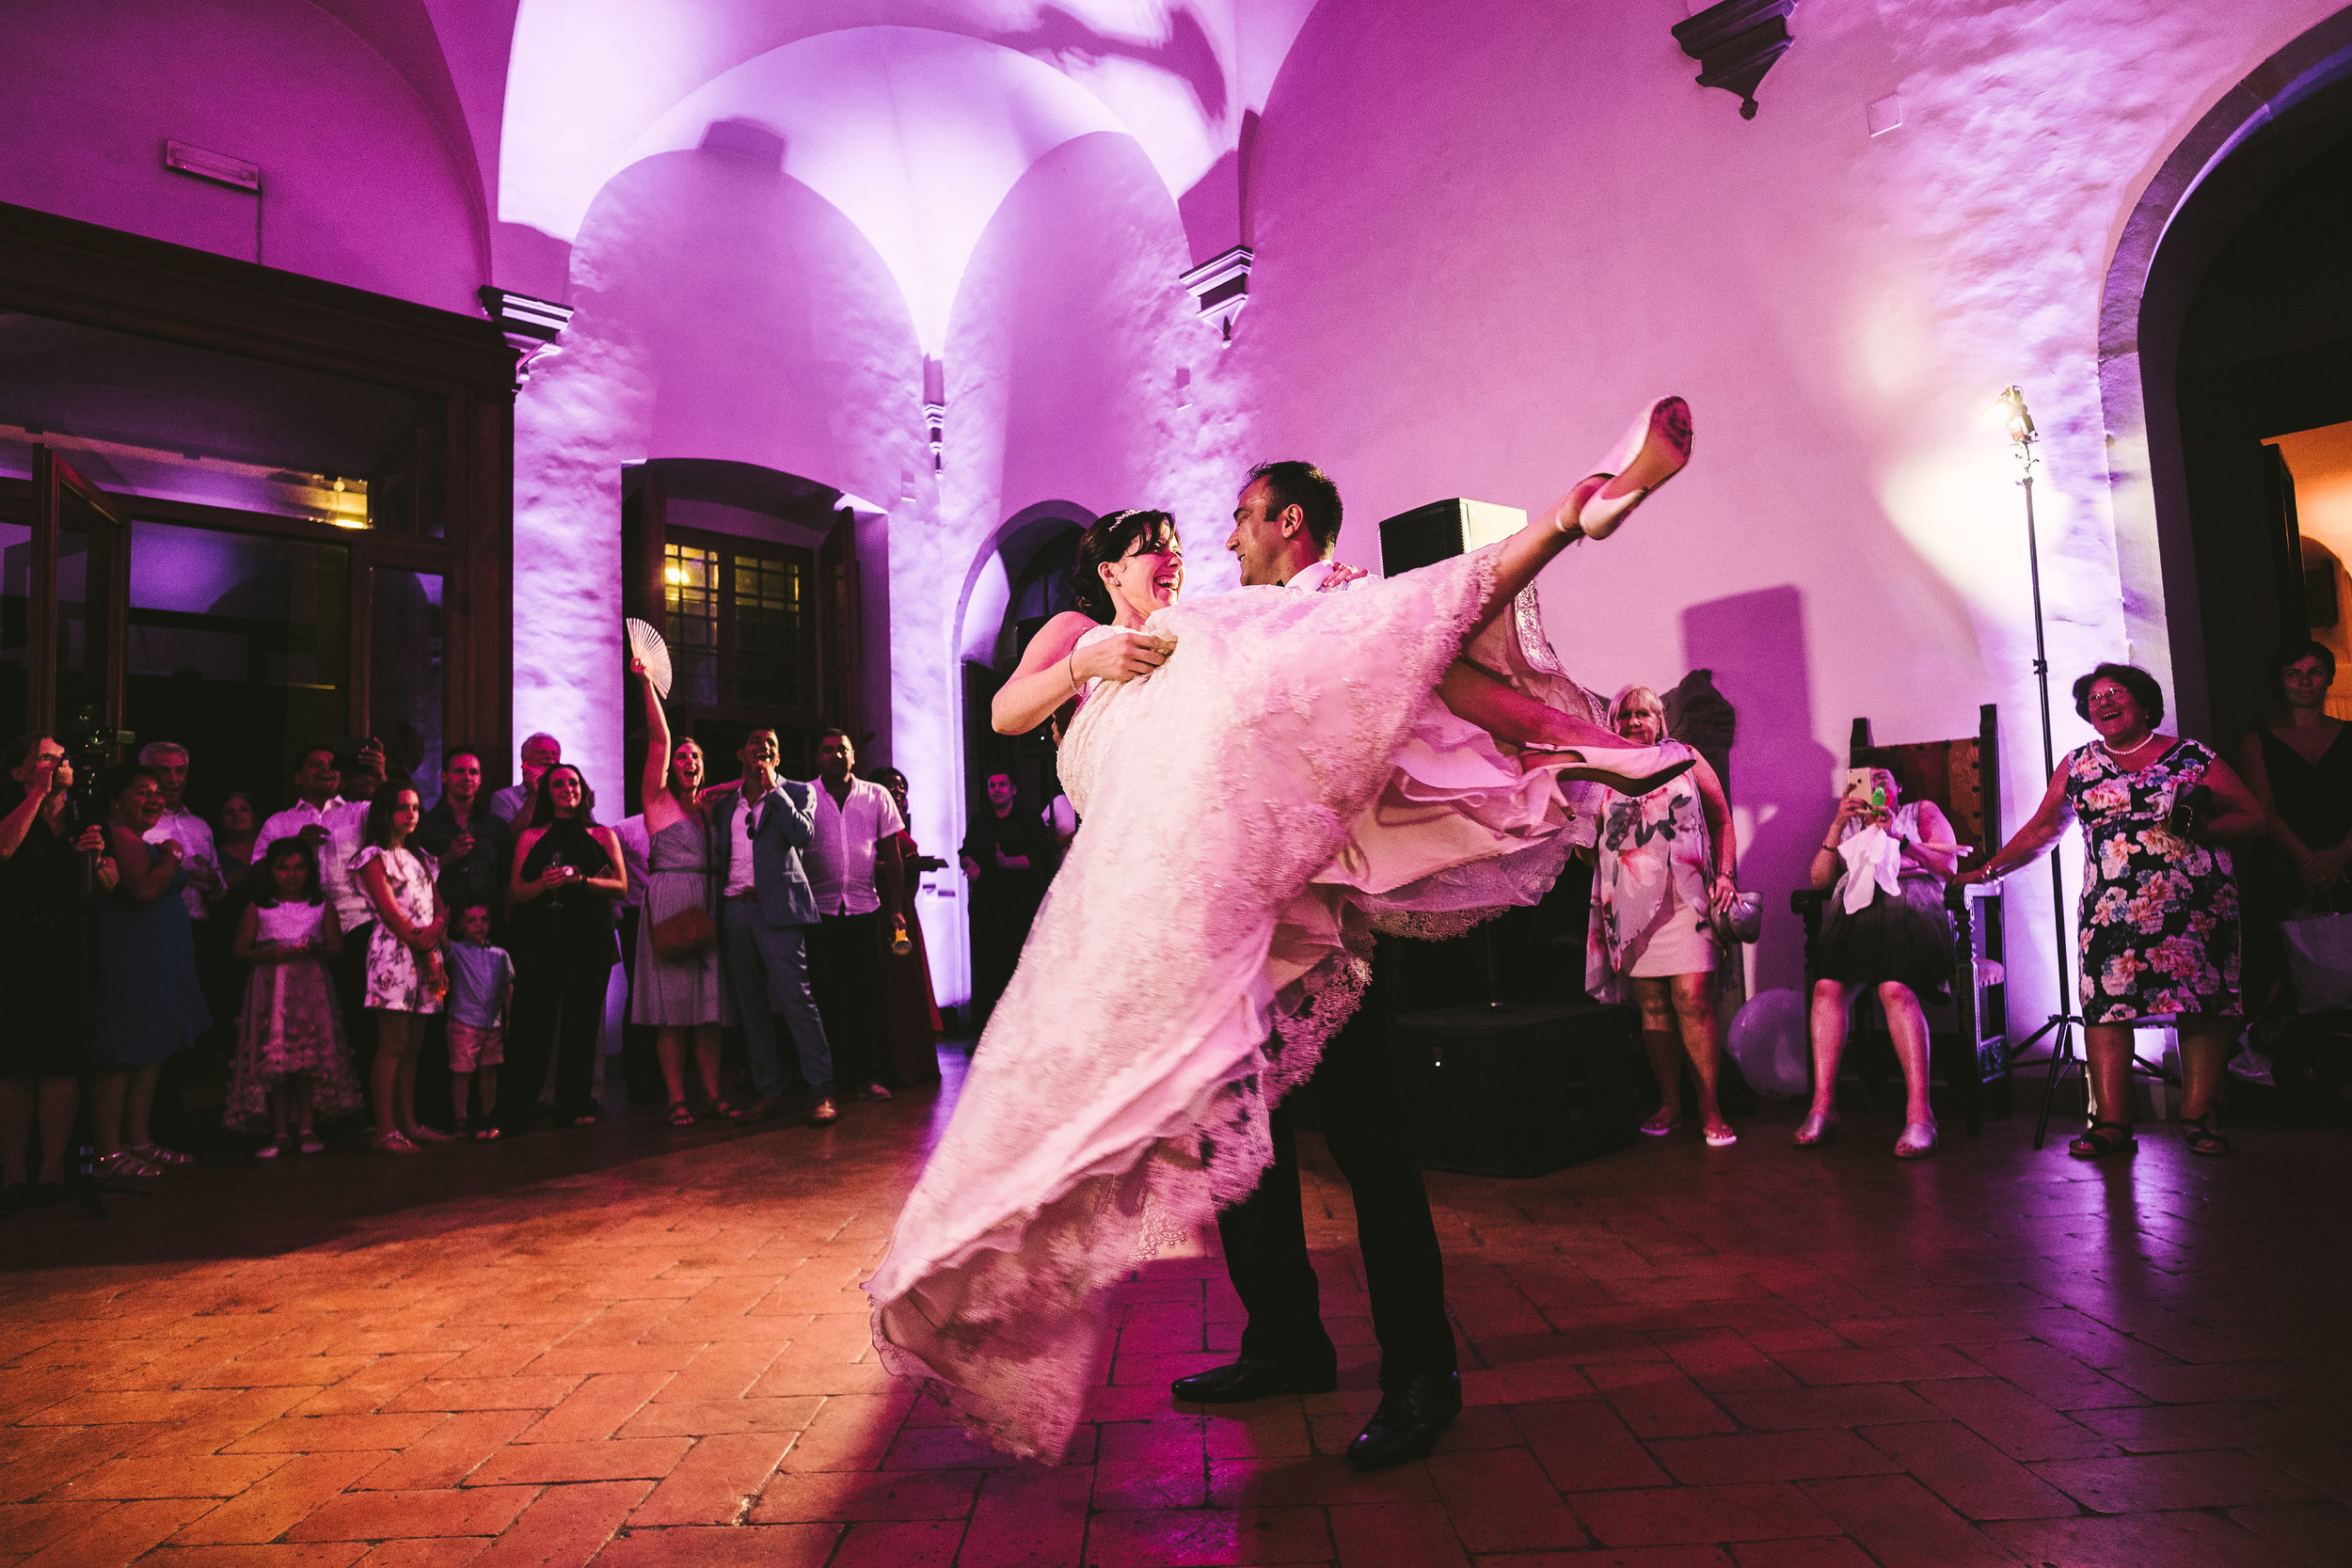 Tuscany-wedding-venue.jpg